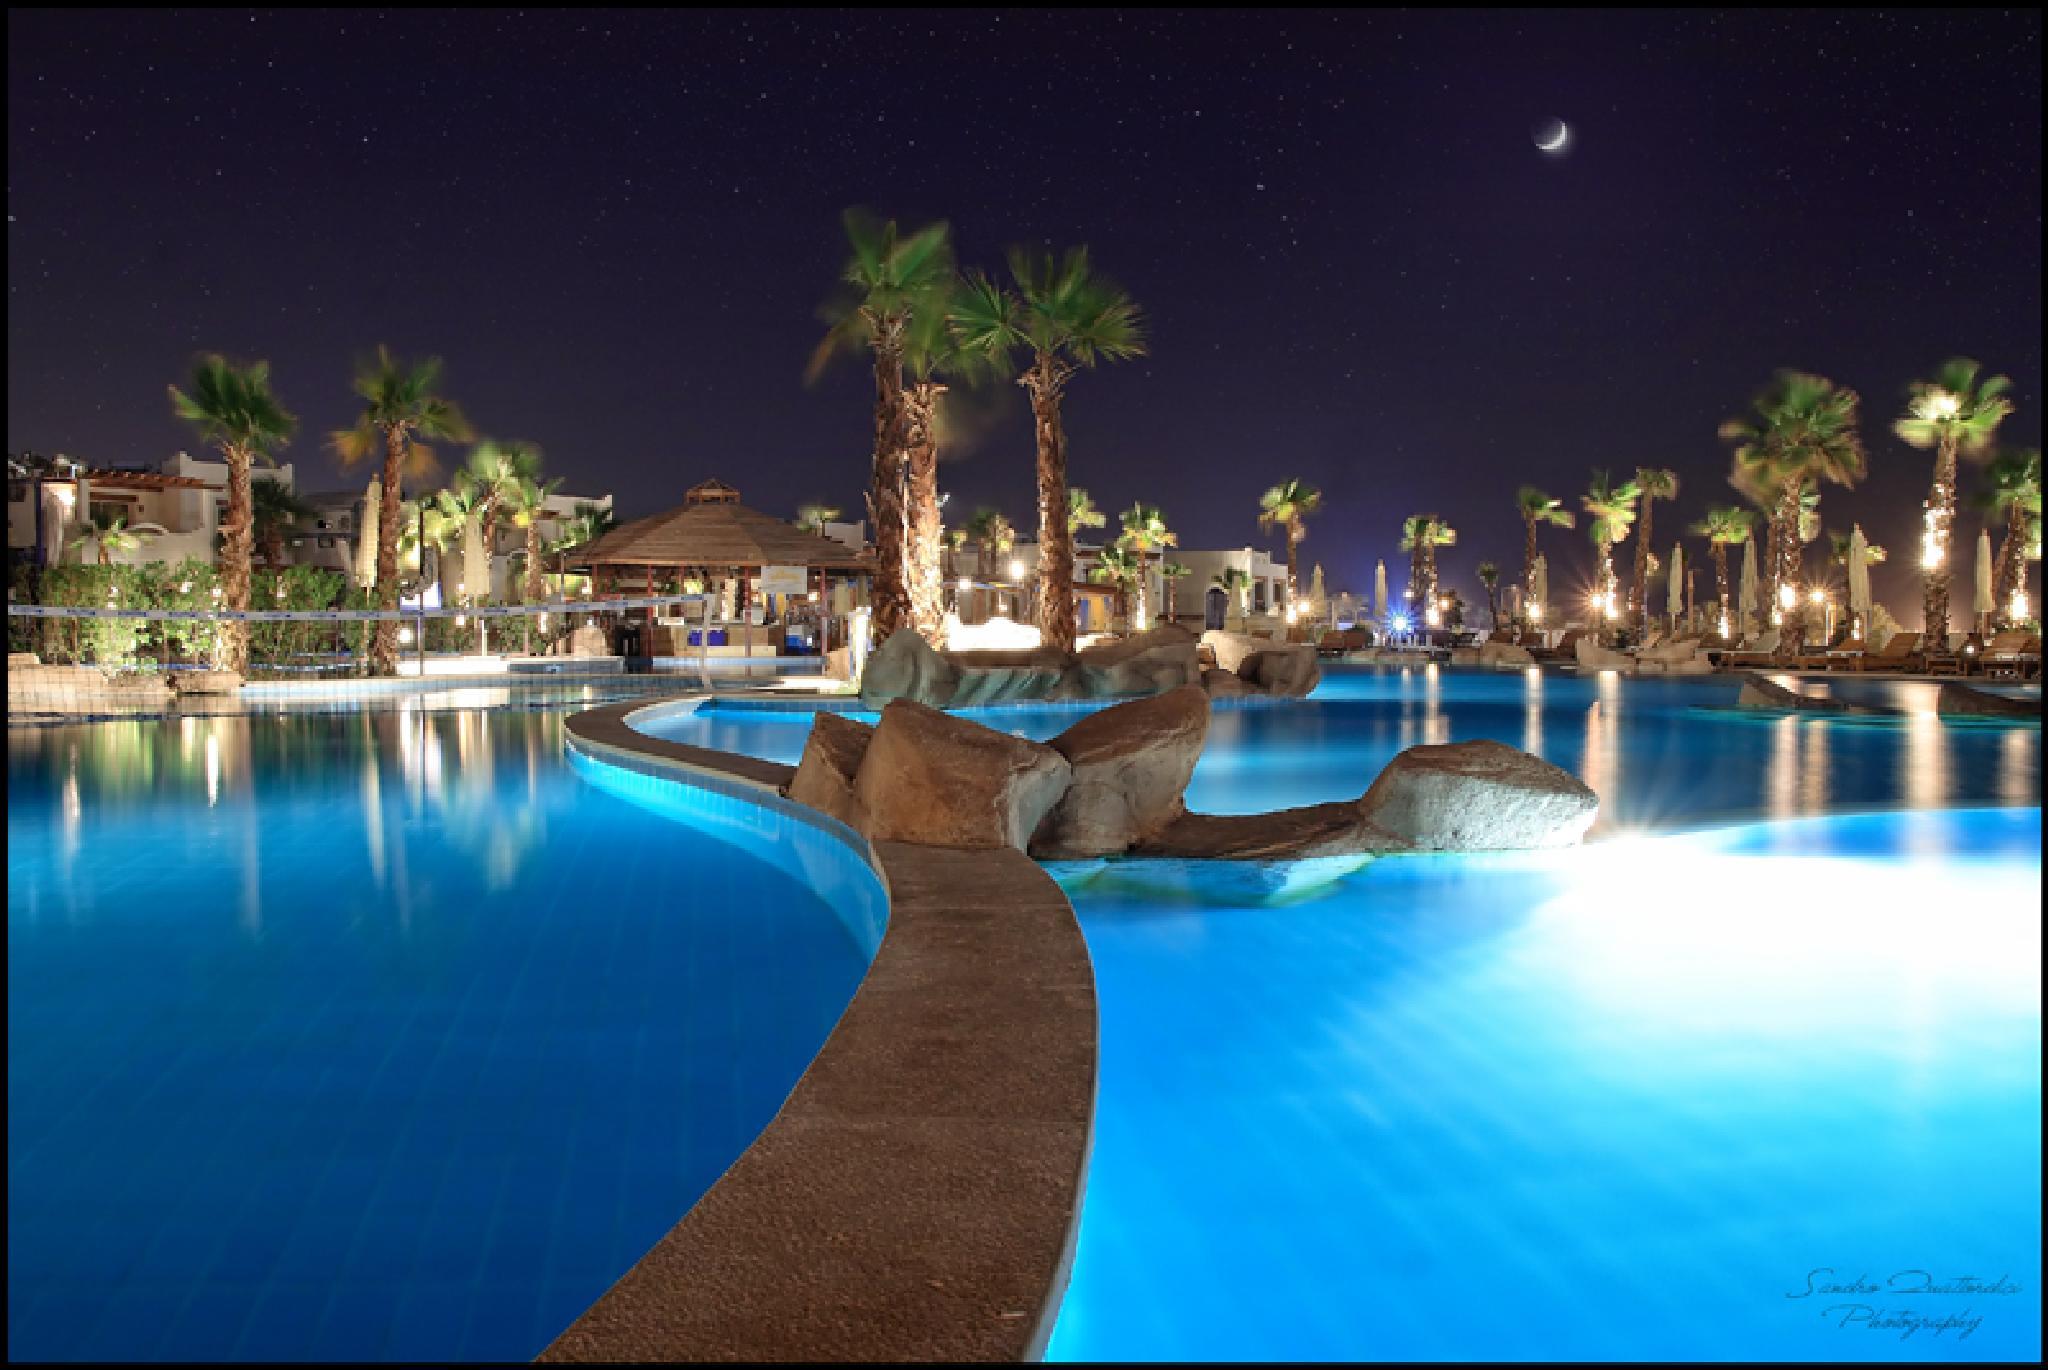 Dreaming Pool by Sandro Quattordici